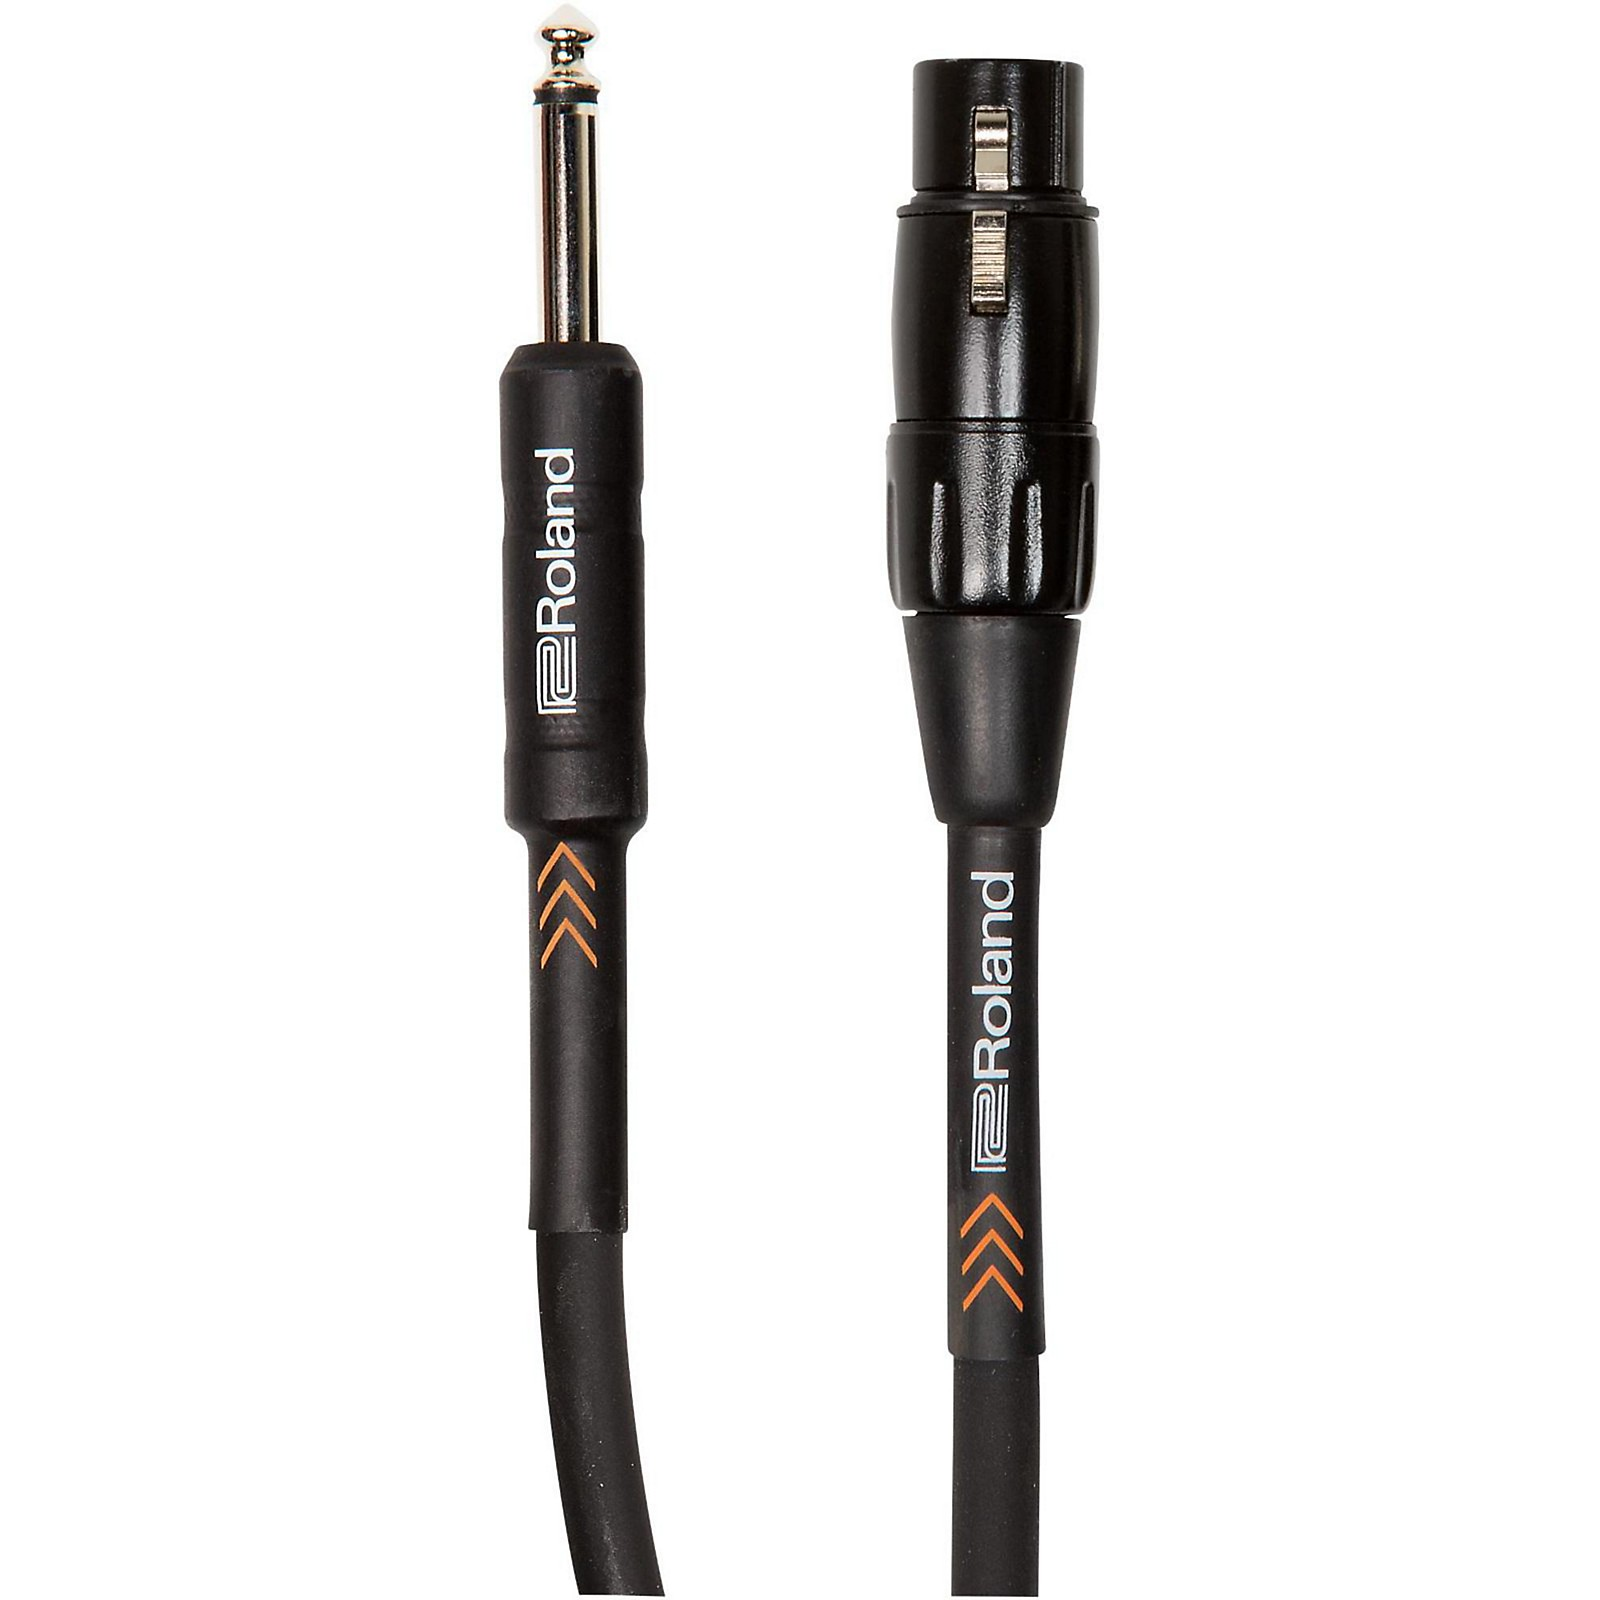 Roland Black Series XLR Hi-Z Microphone Cable